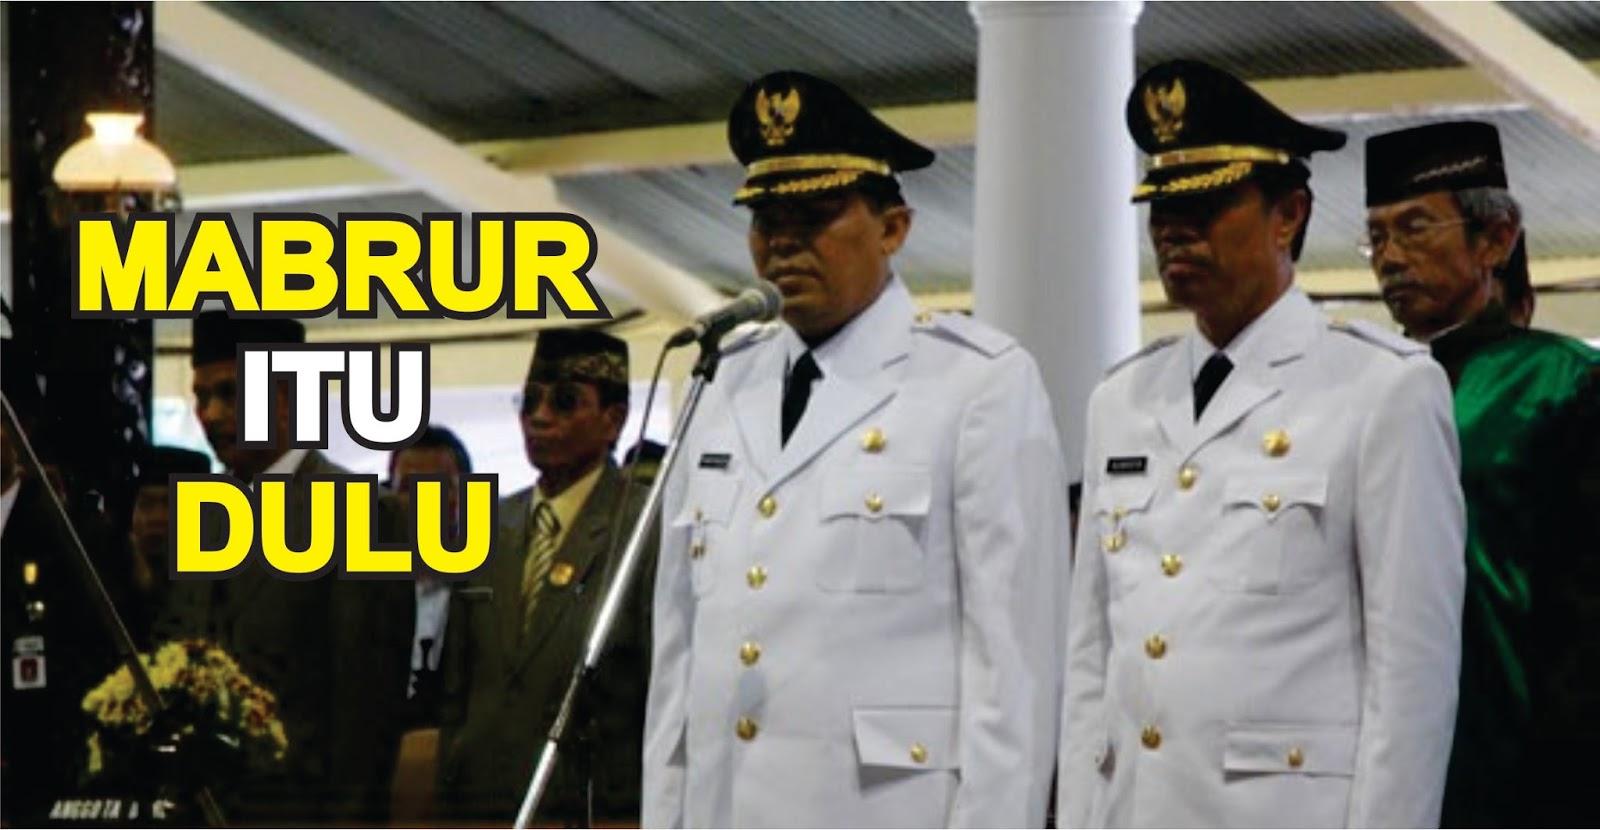 Pilkada Jepara 2017 Marzuqi Subroto Tidak Mabrur Lagi Fokus Jepara